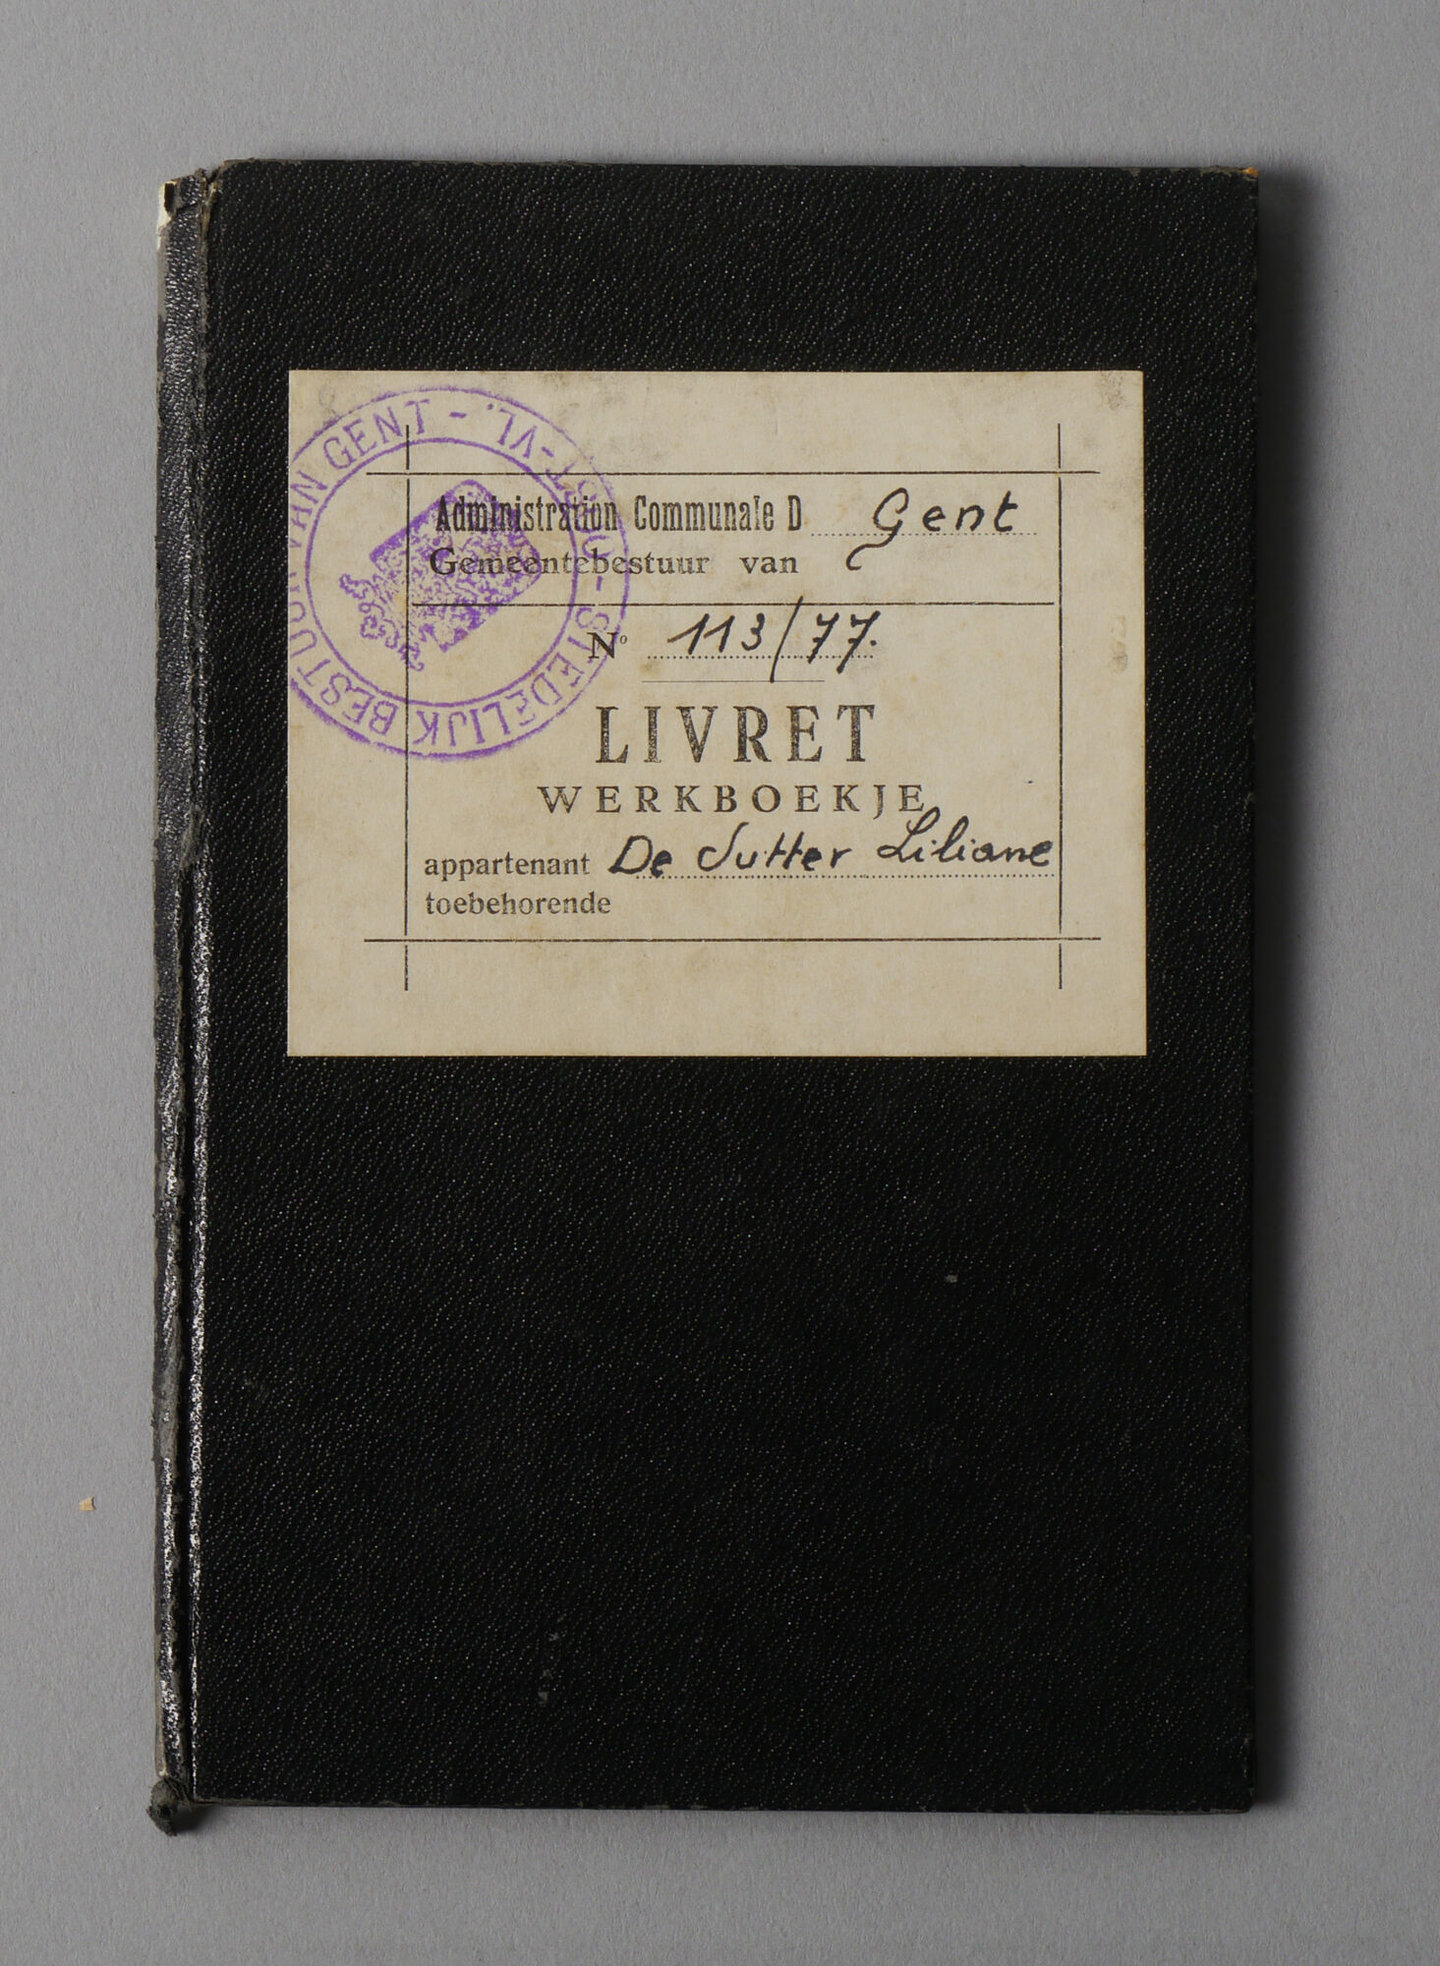 Werkboekje van Liliane De Sutter